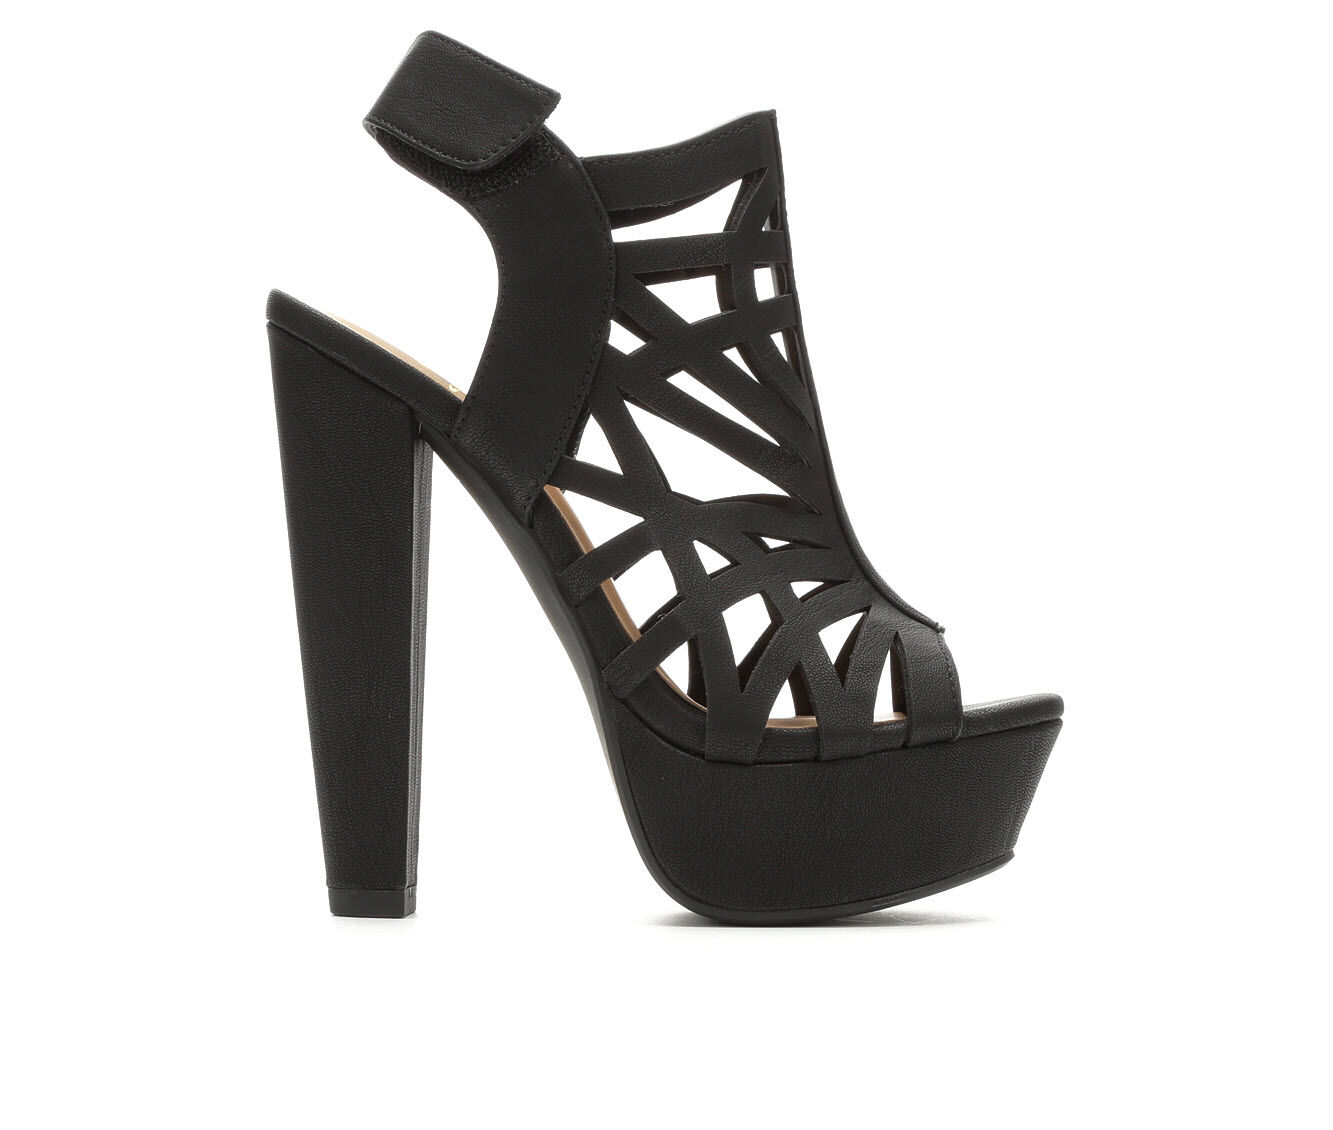 Women's Delicious Factor Heeled Sandals Black